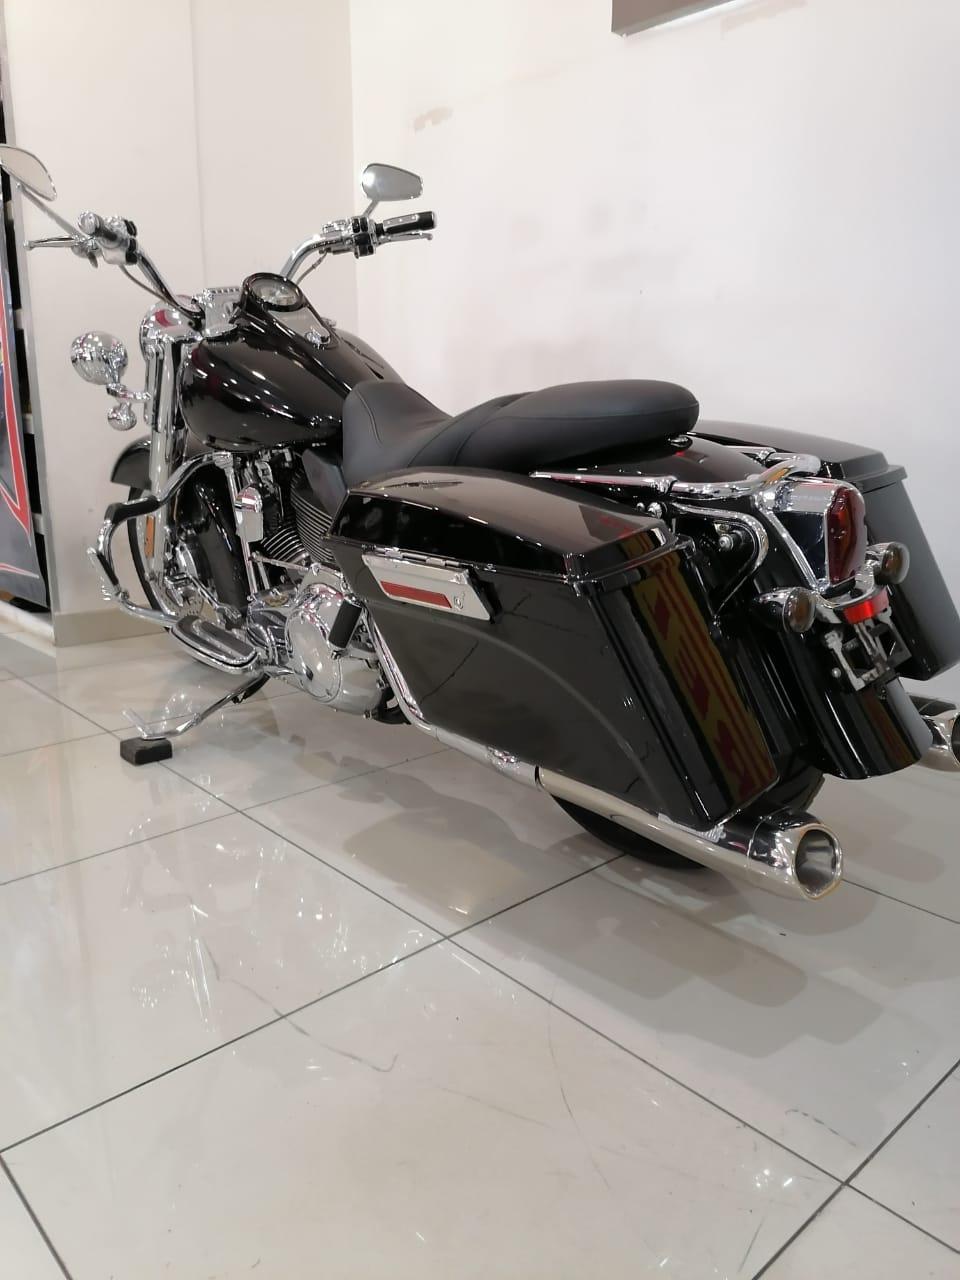 2009 Harley Davidson Road King